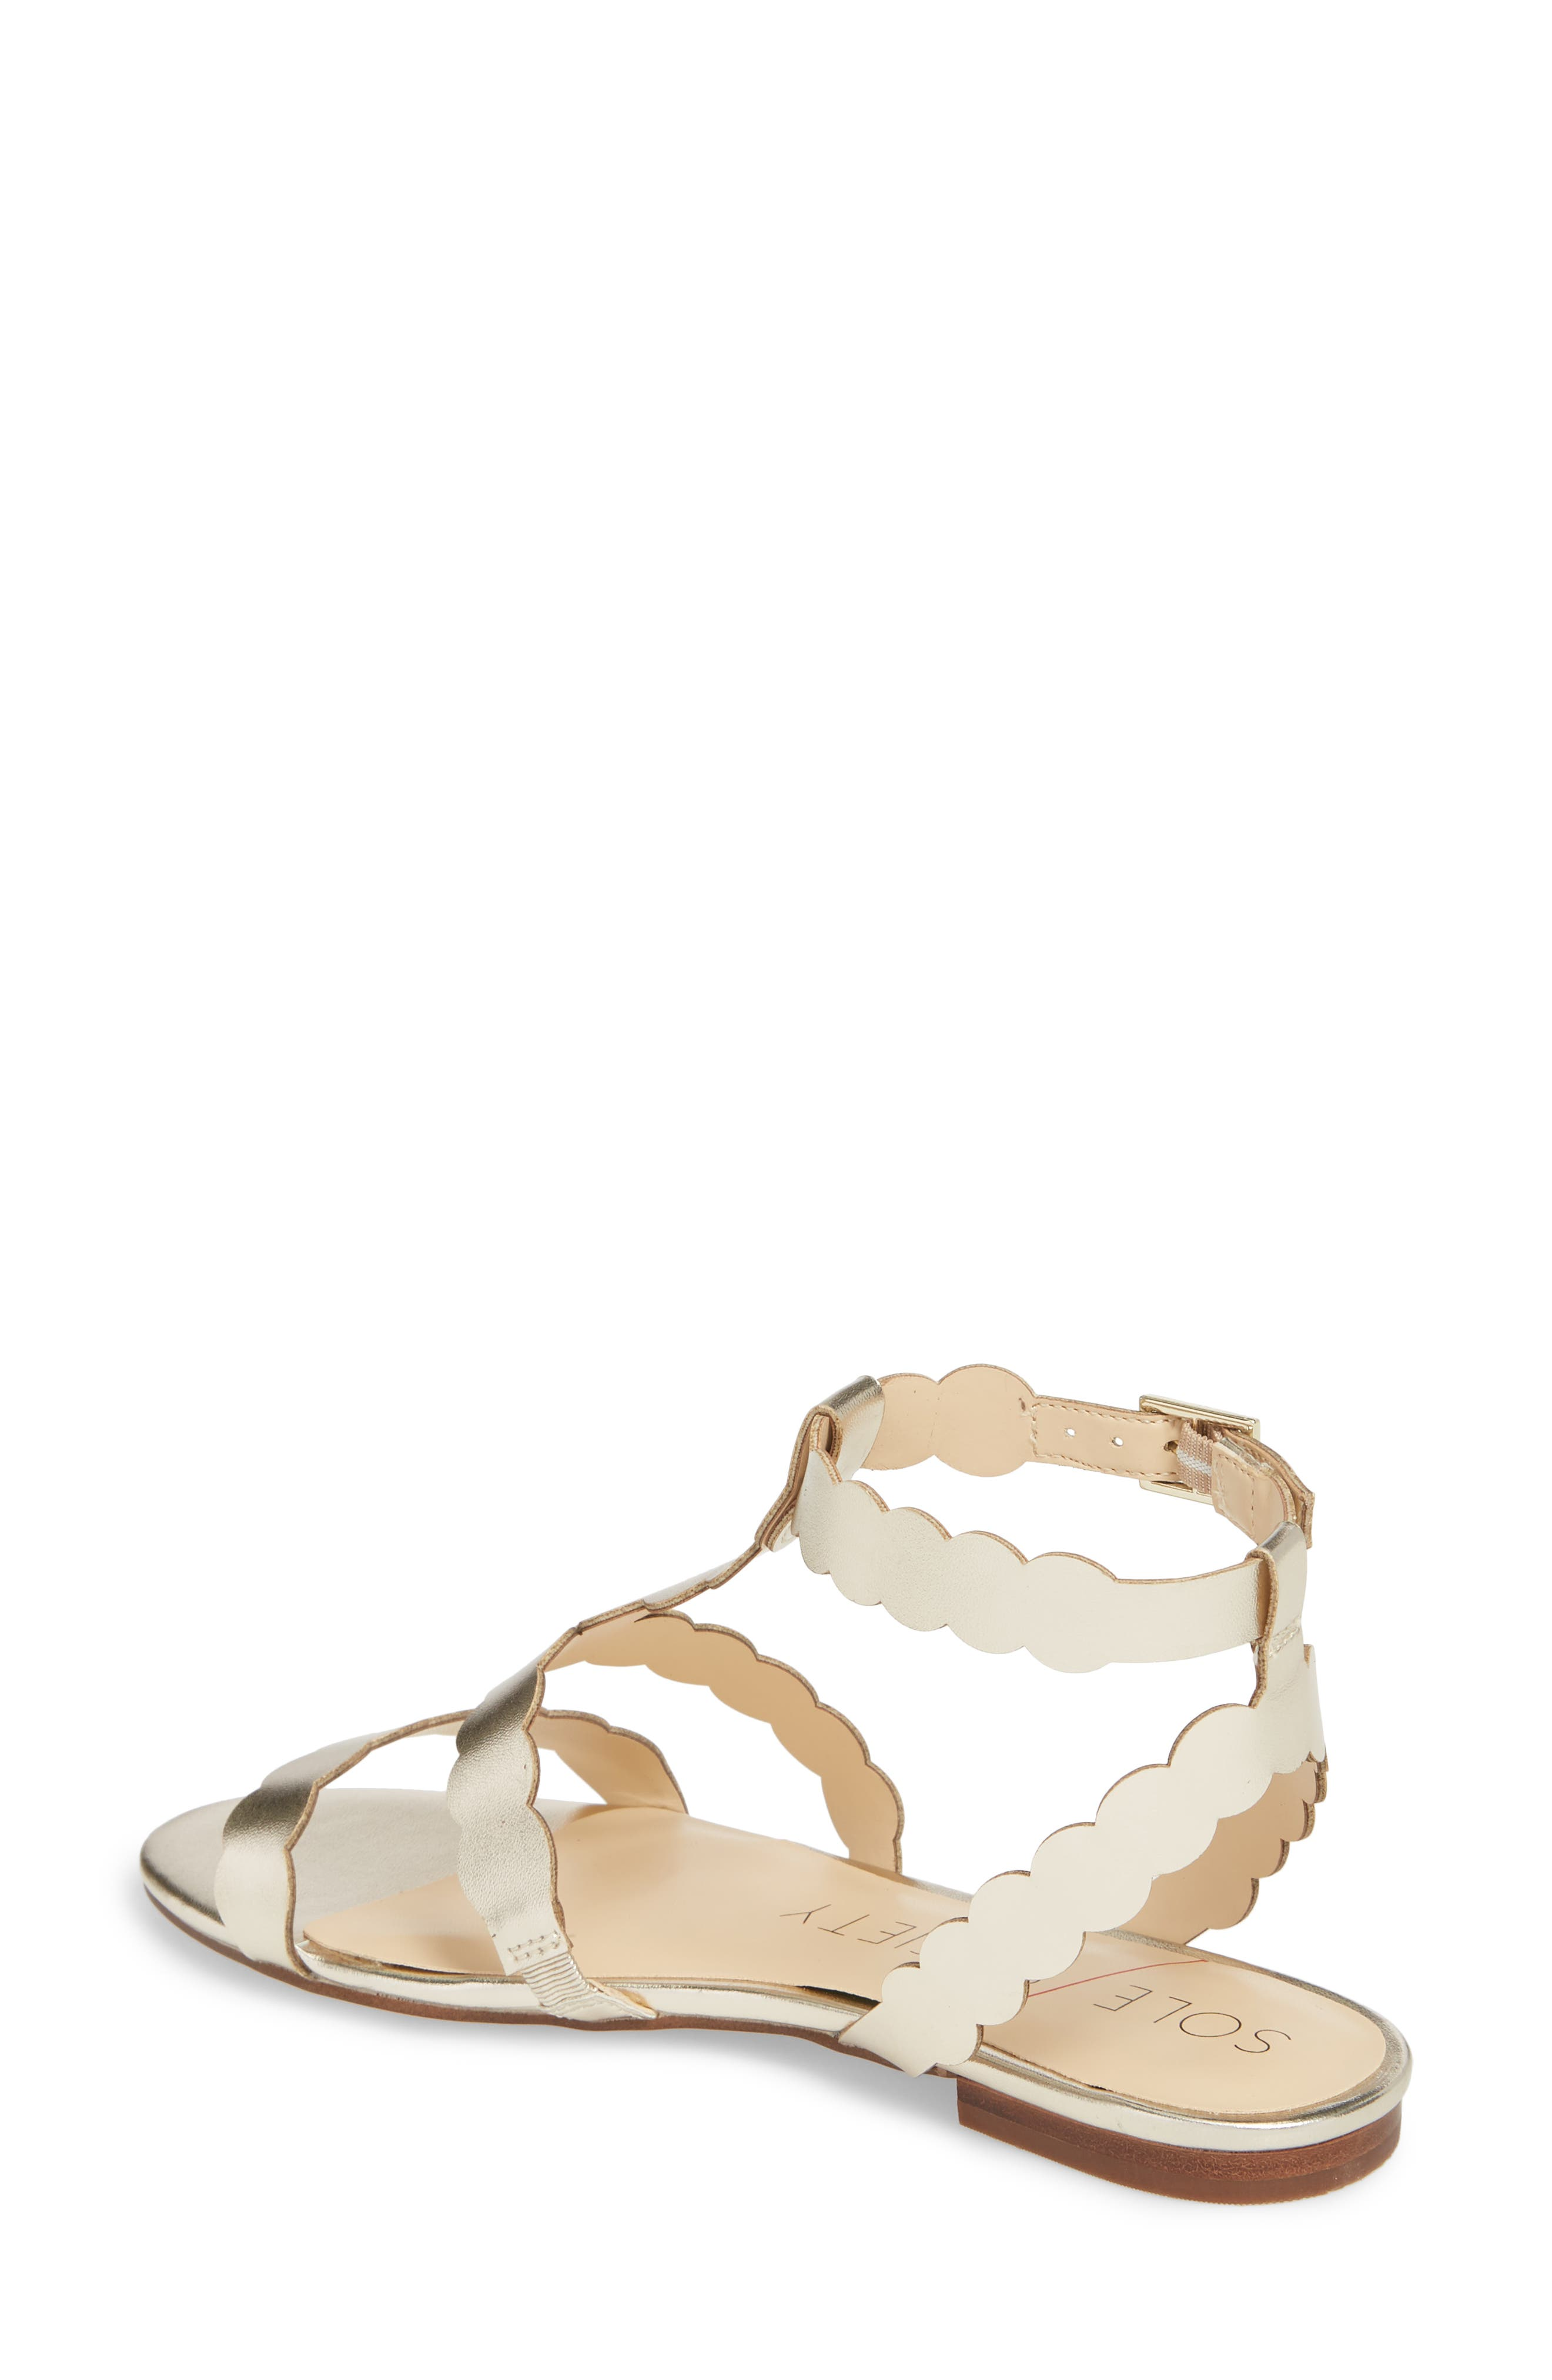 So-Maladee Flat Sandal,                             Alternate thumbnail 2, color,                             Totes Gold